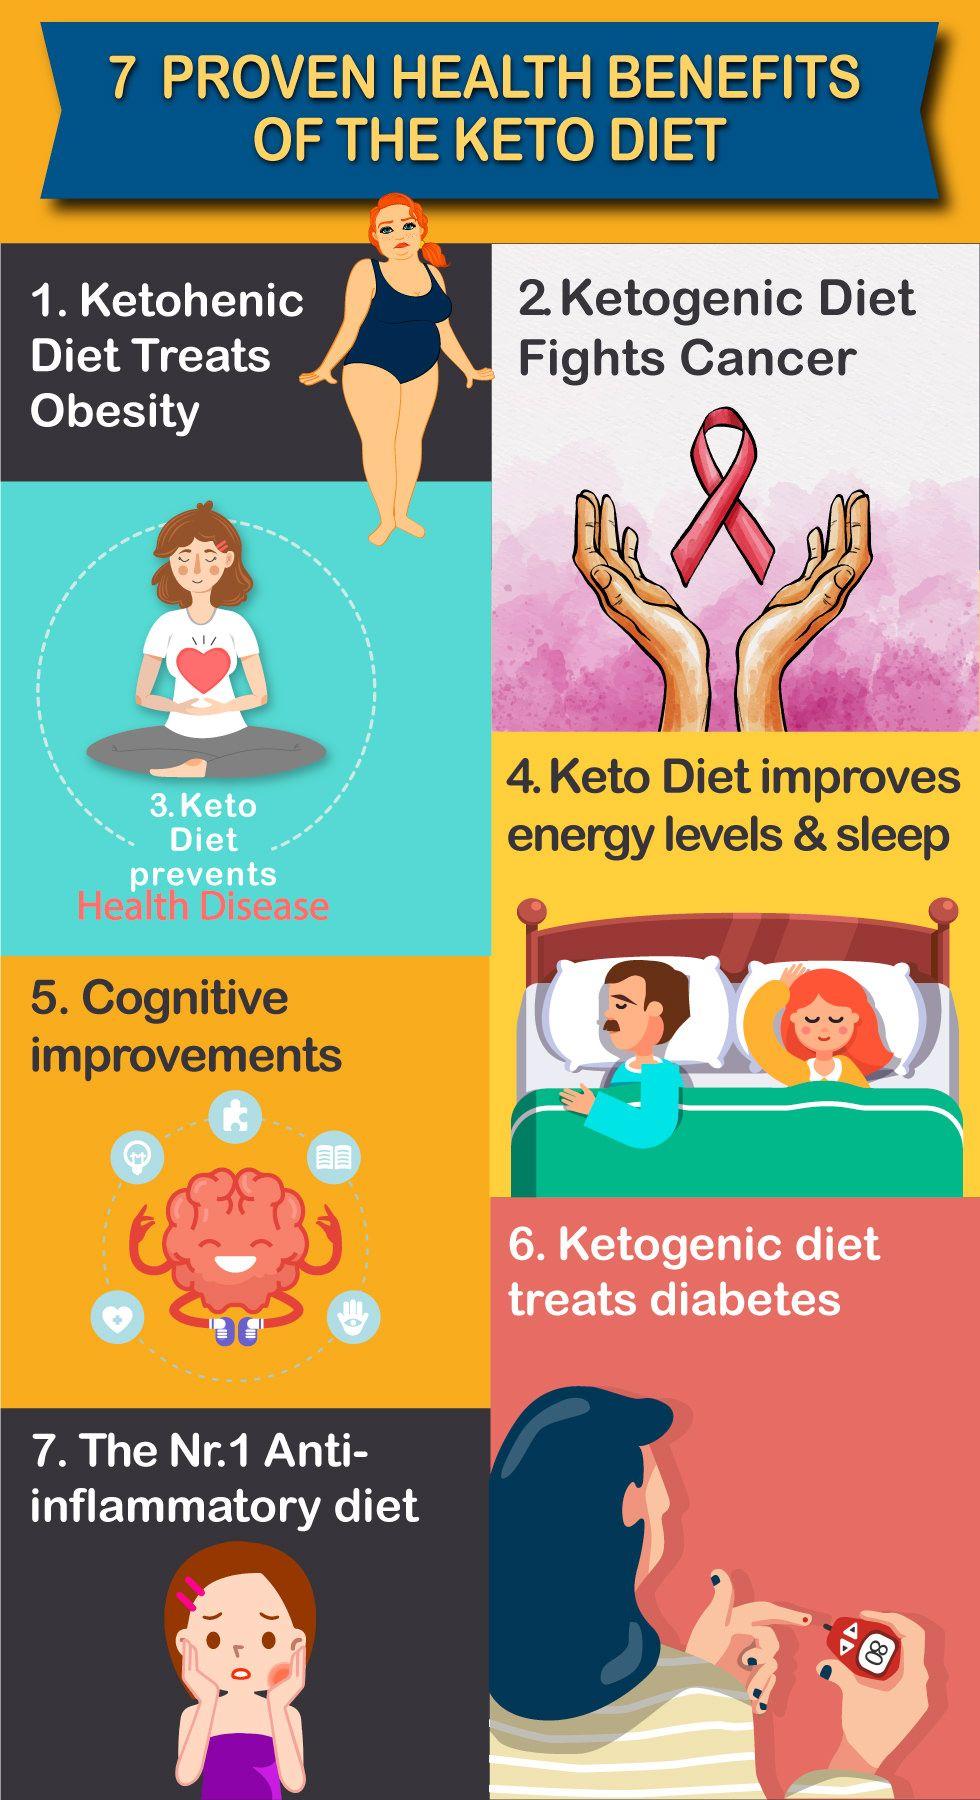 Proven health benefits of Keto Diet